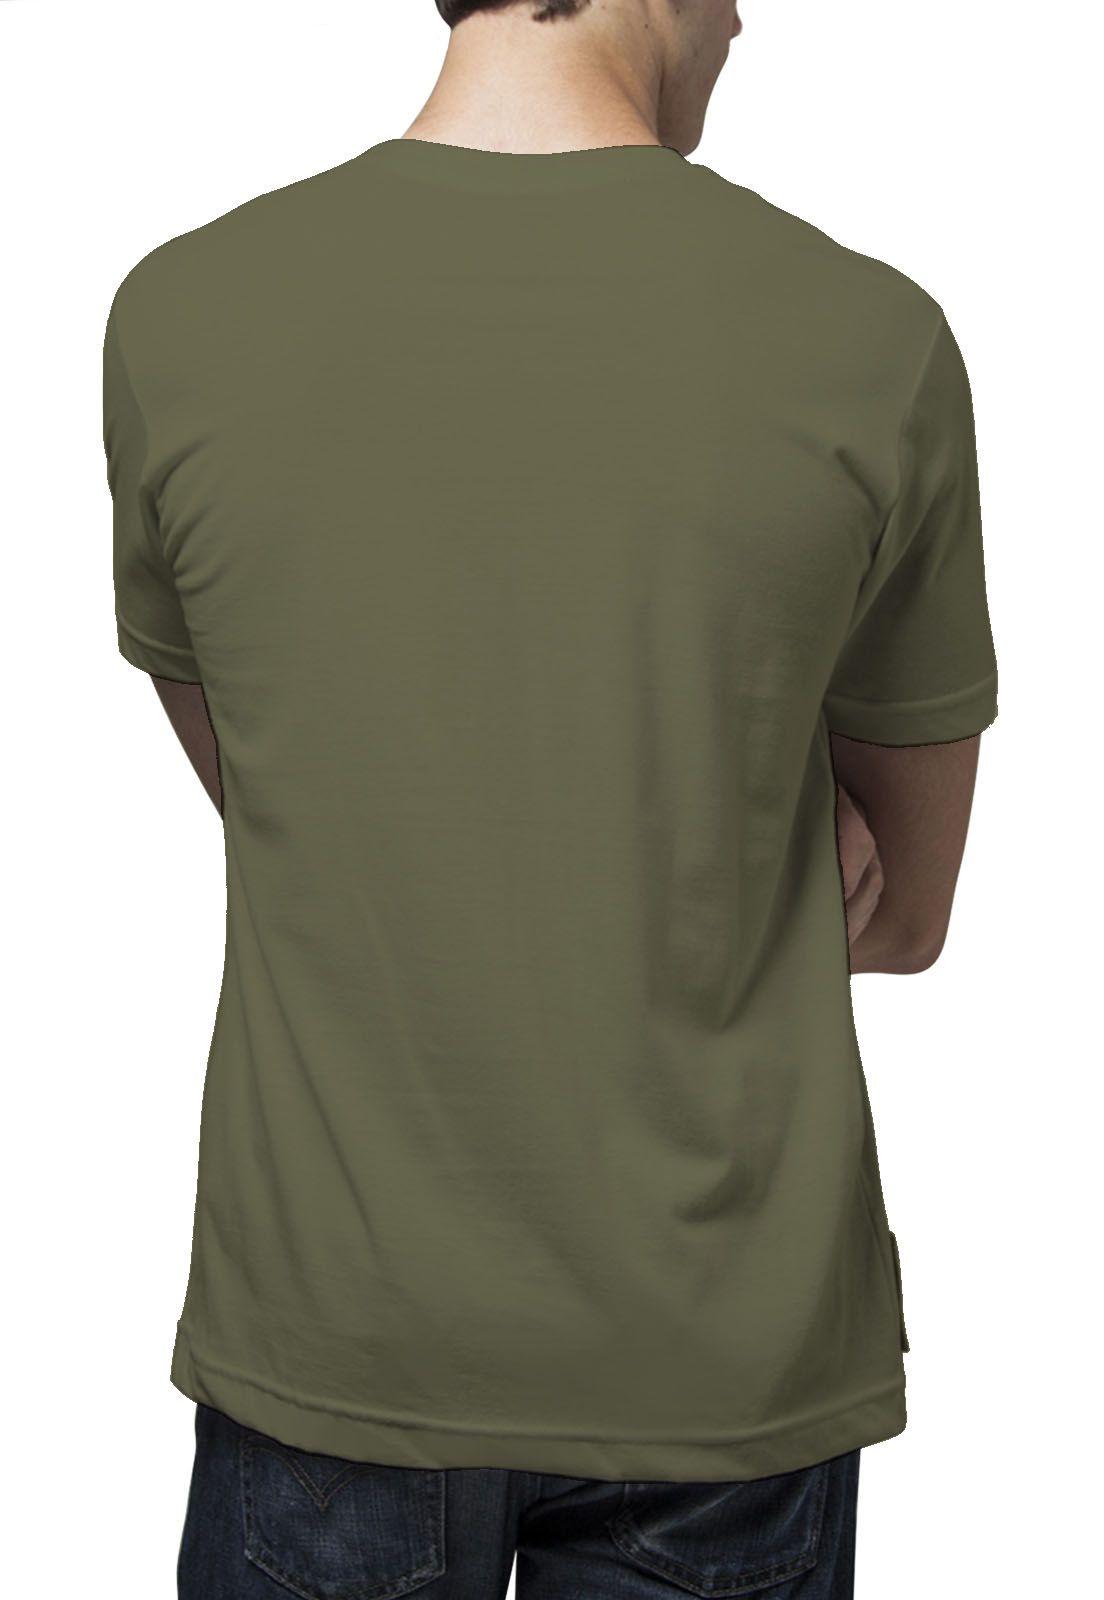 Camiseta Amazônia Eletrocardio - Verde